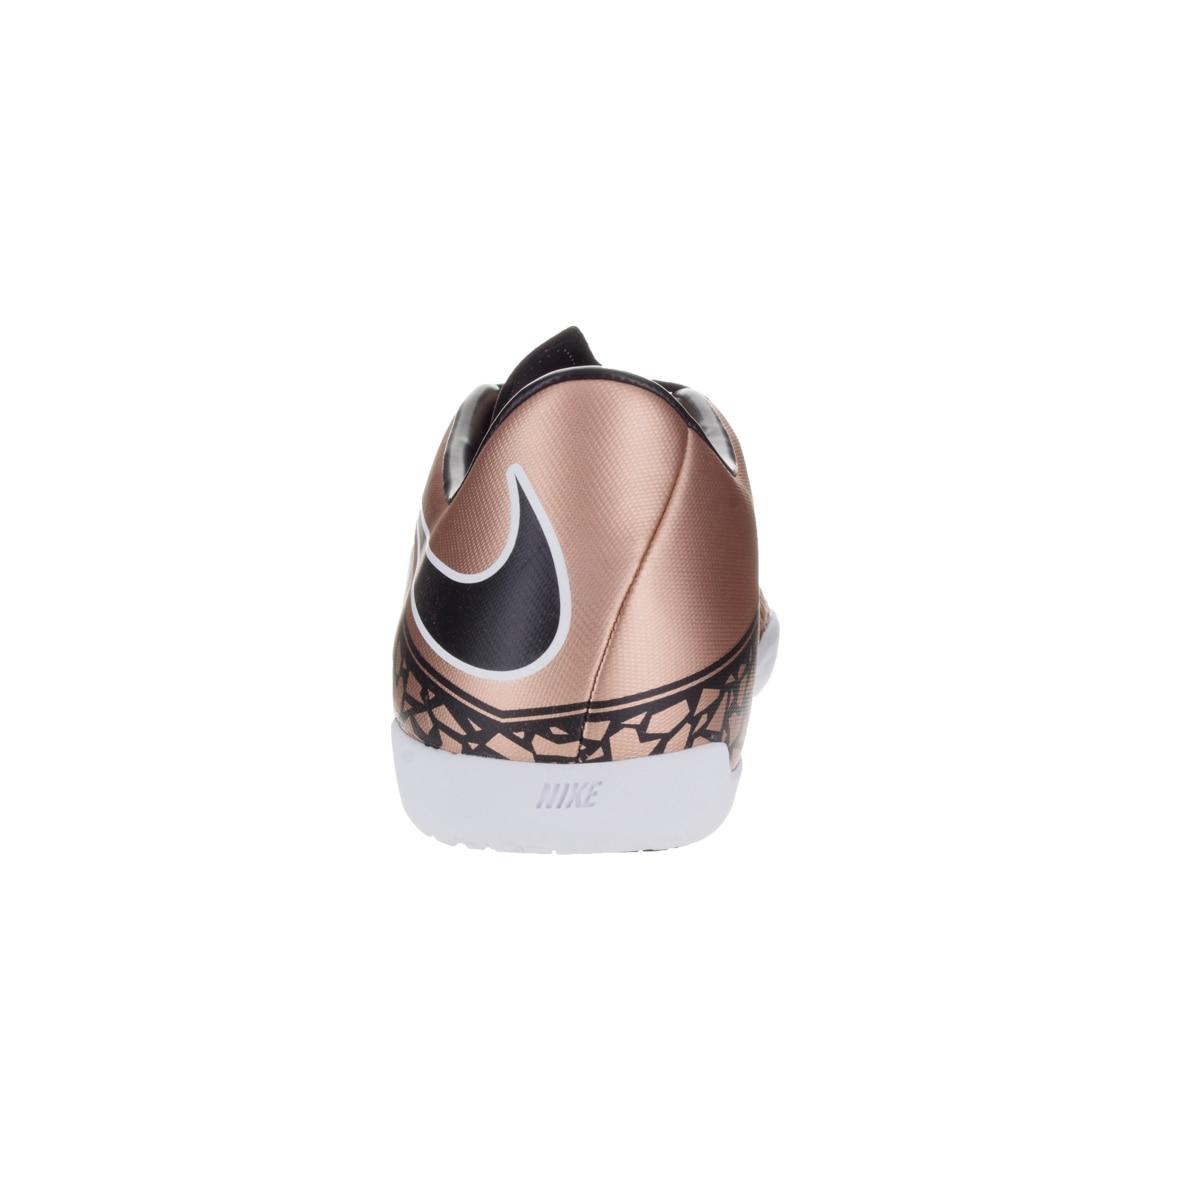 buy online 6b441 7aff4 Shop Nike Men s Hypervenom Phelon Ii Ic Rd Bz Black G Glw White Indoor  Soccer Shoe - Free Shipping Today - Overstock - 12328546